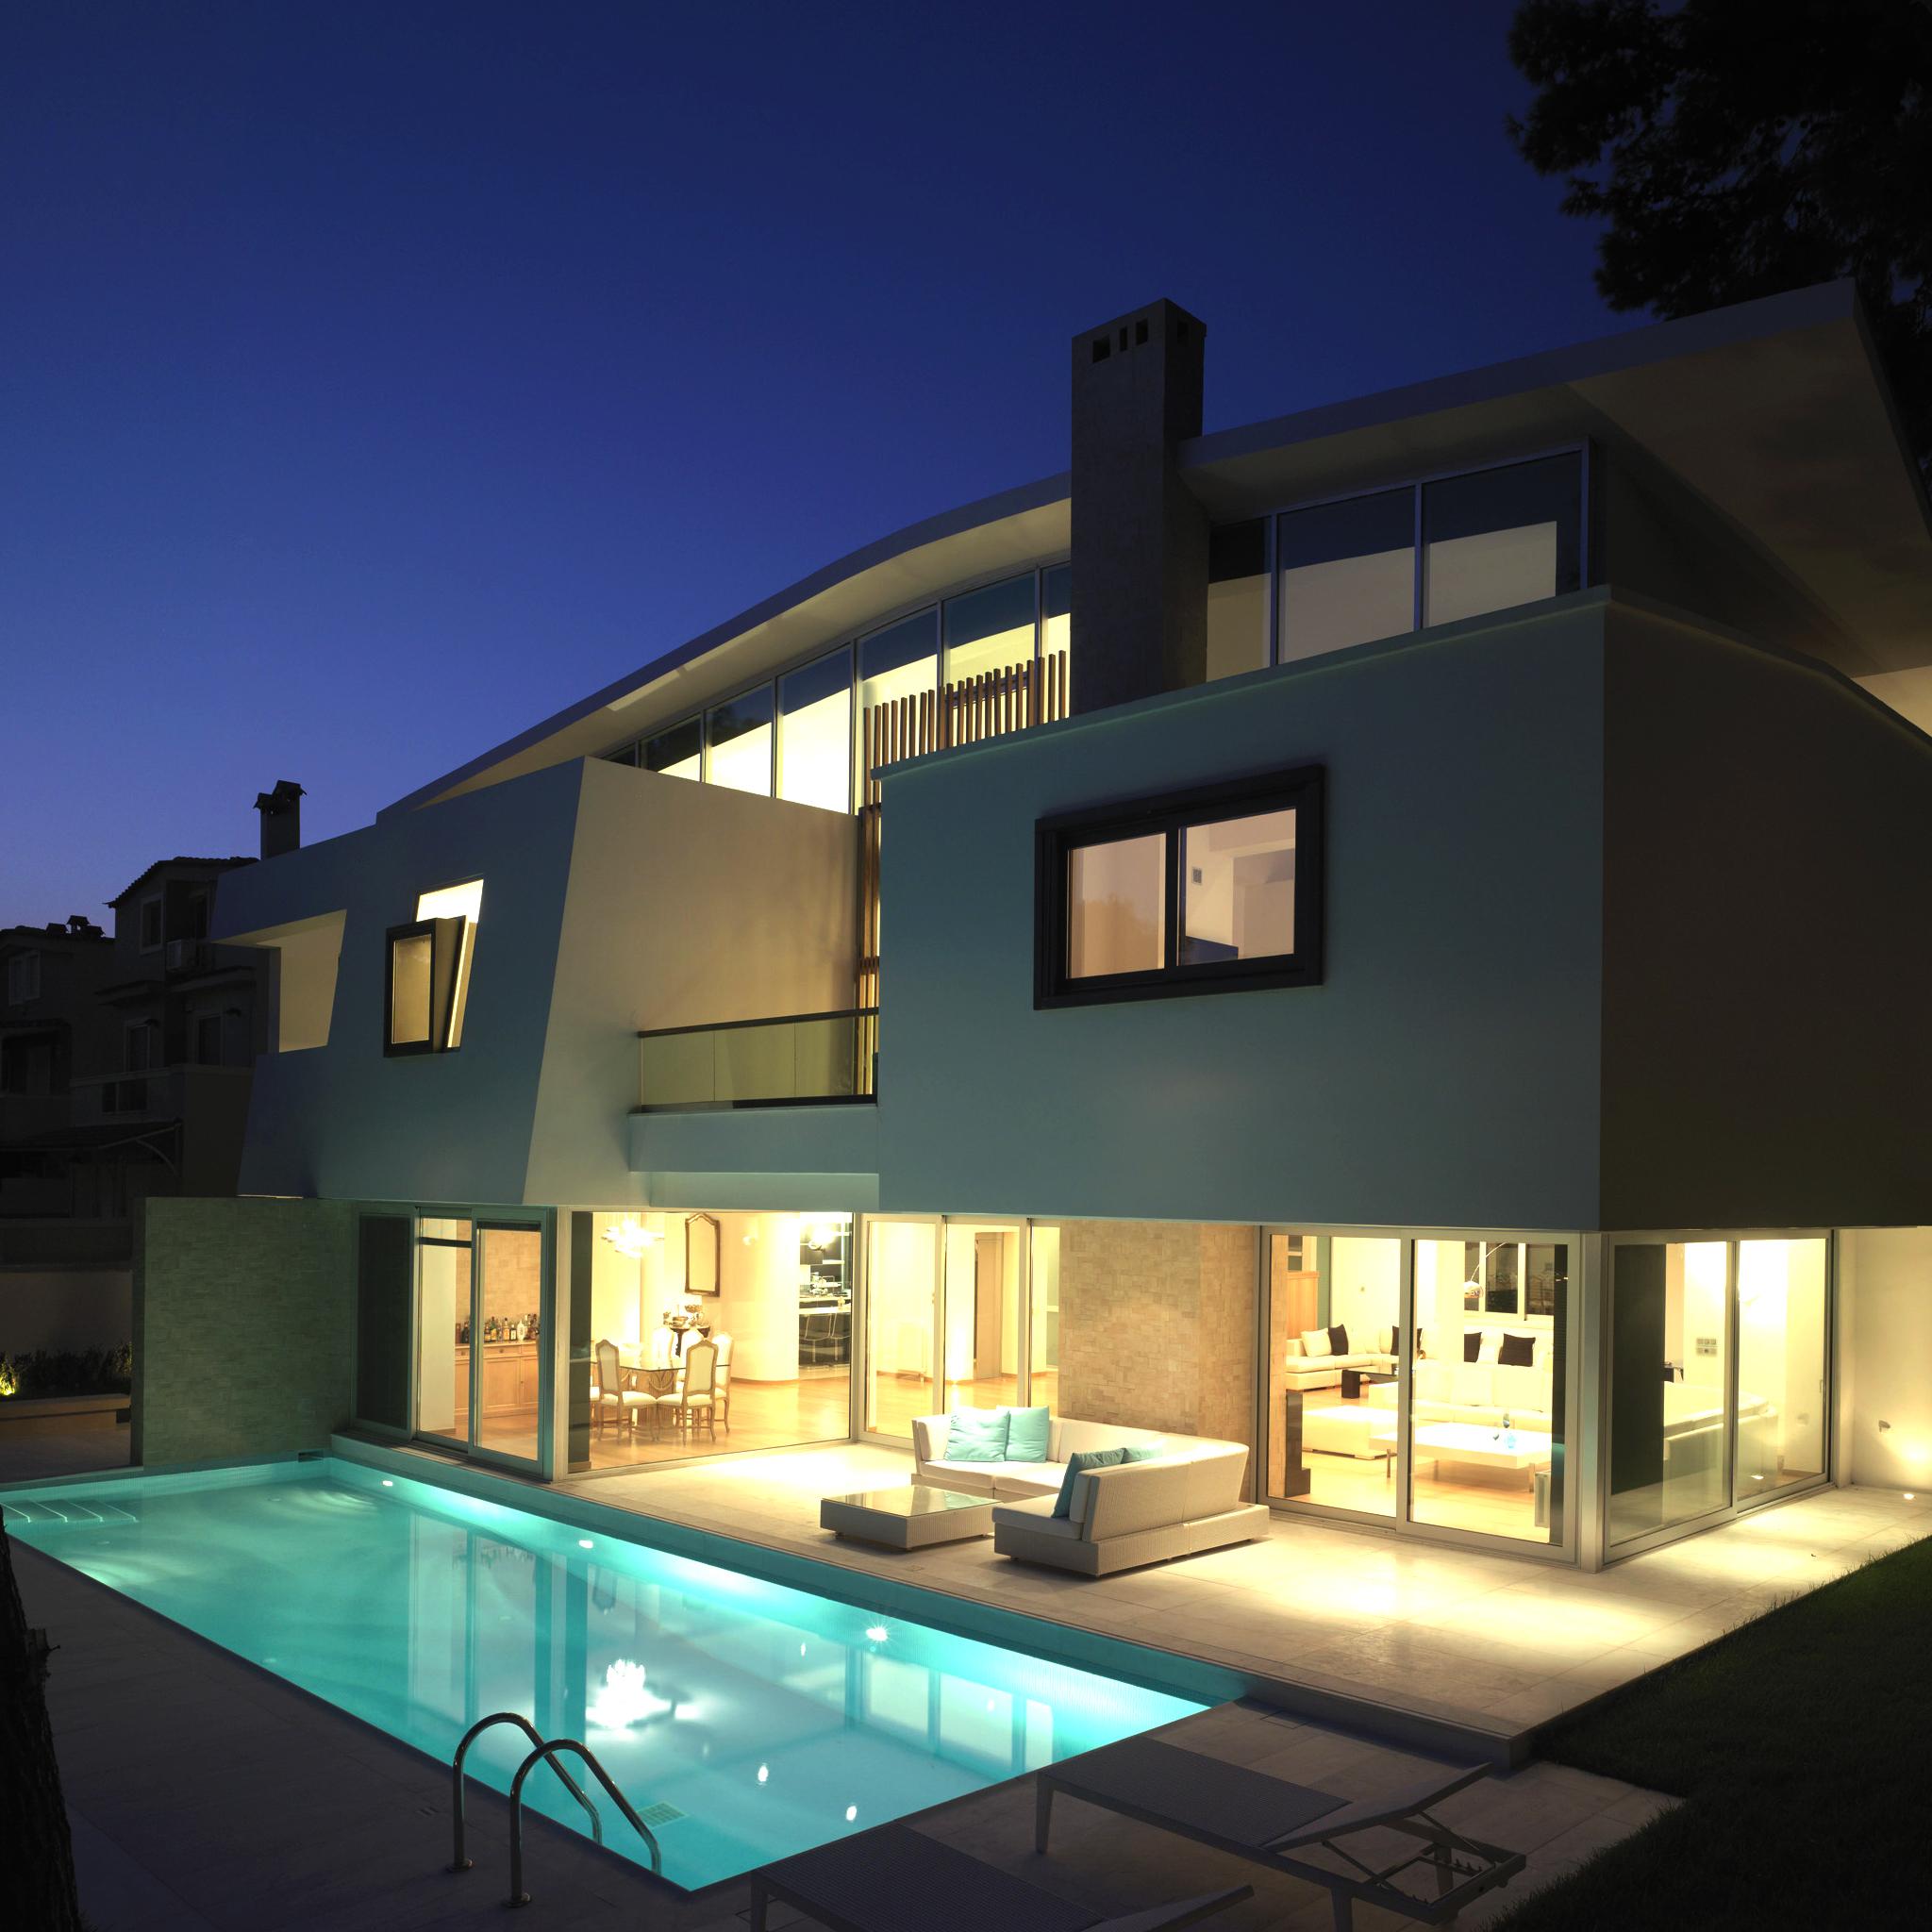 Ekali-Architecture-3Wallpapers-iPad-Retina